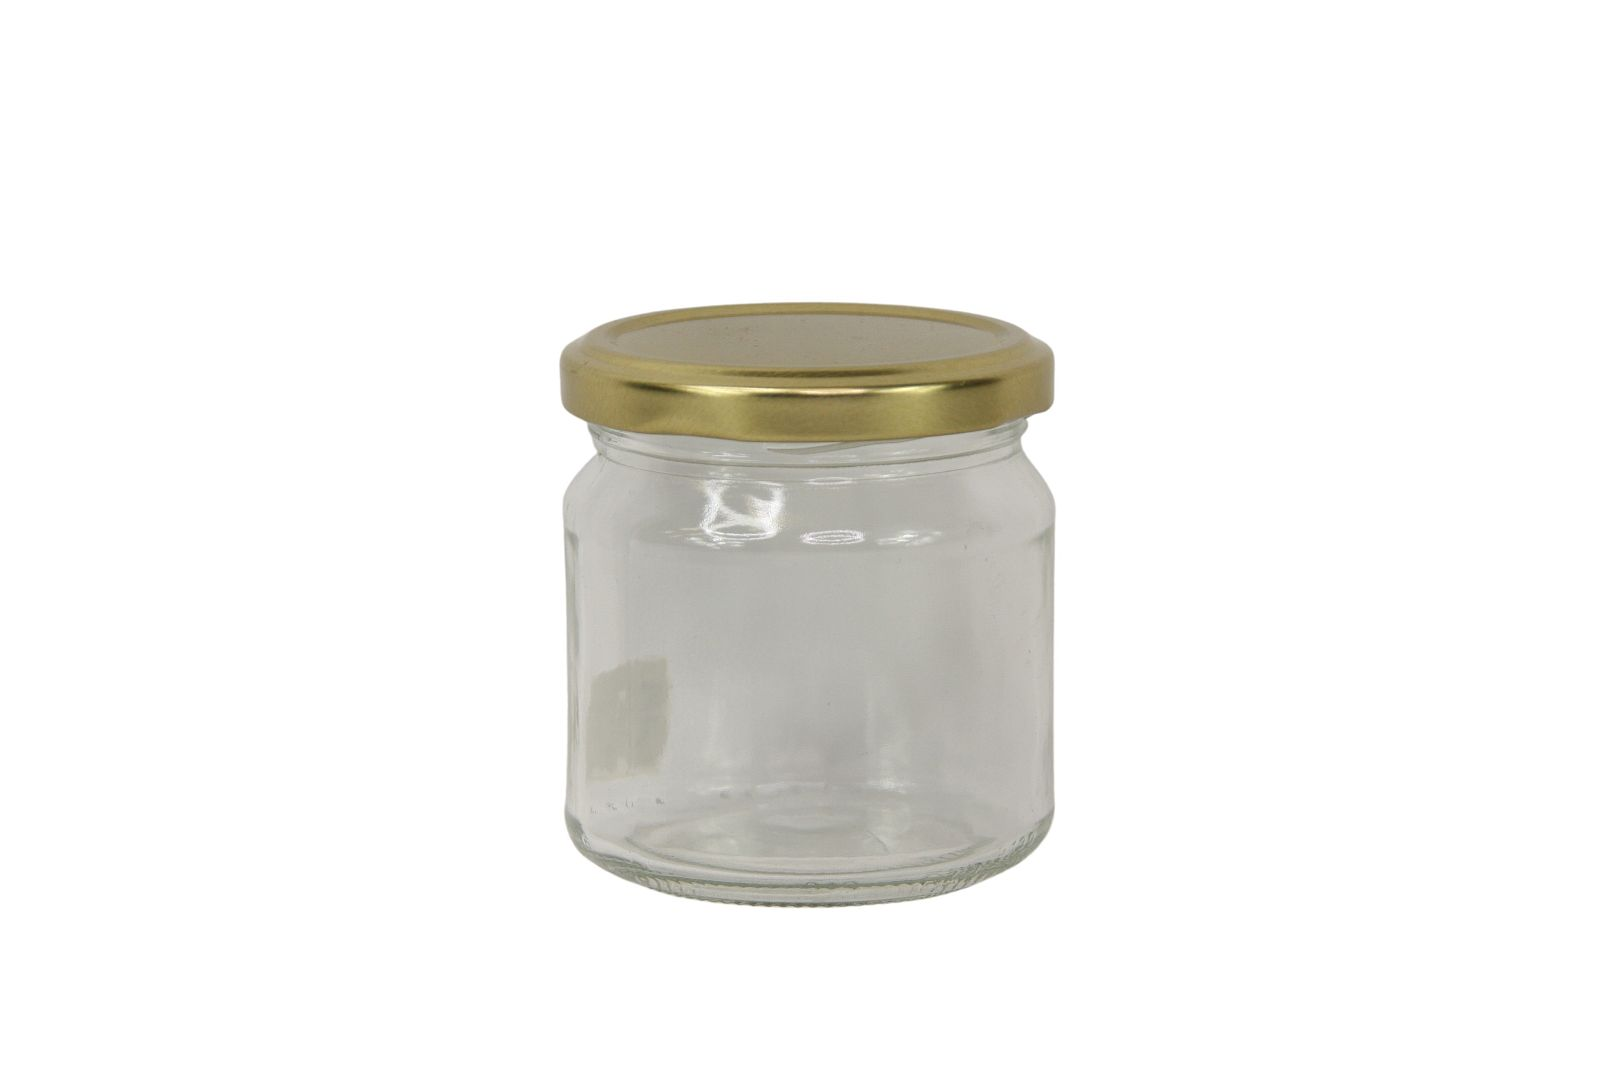 Honigglas 0,25kg glatt inkl. Deckel